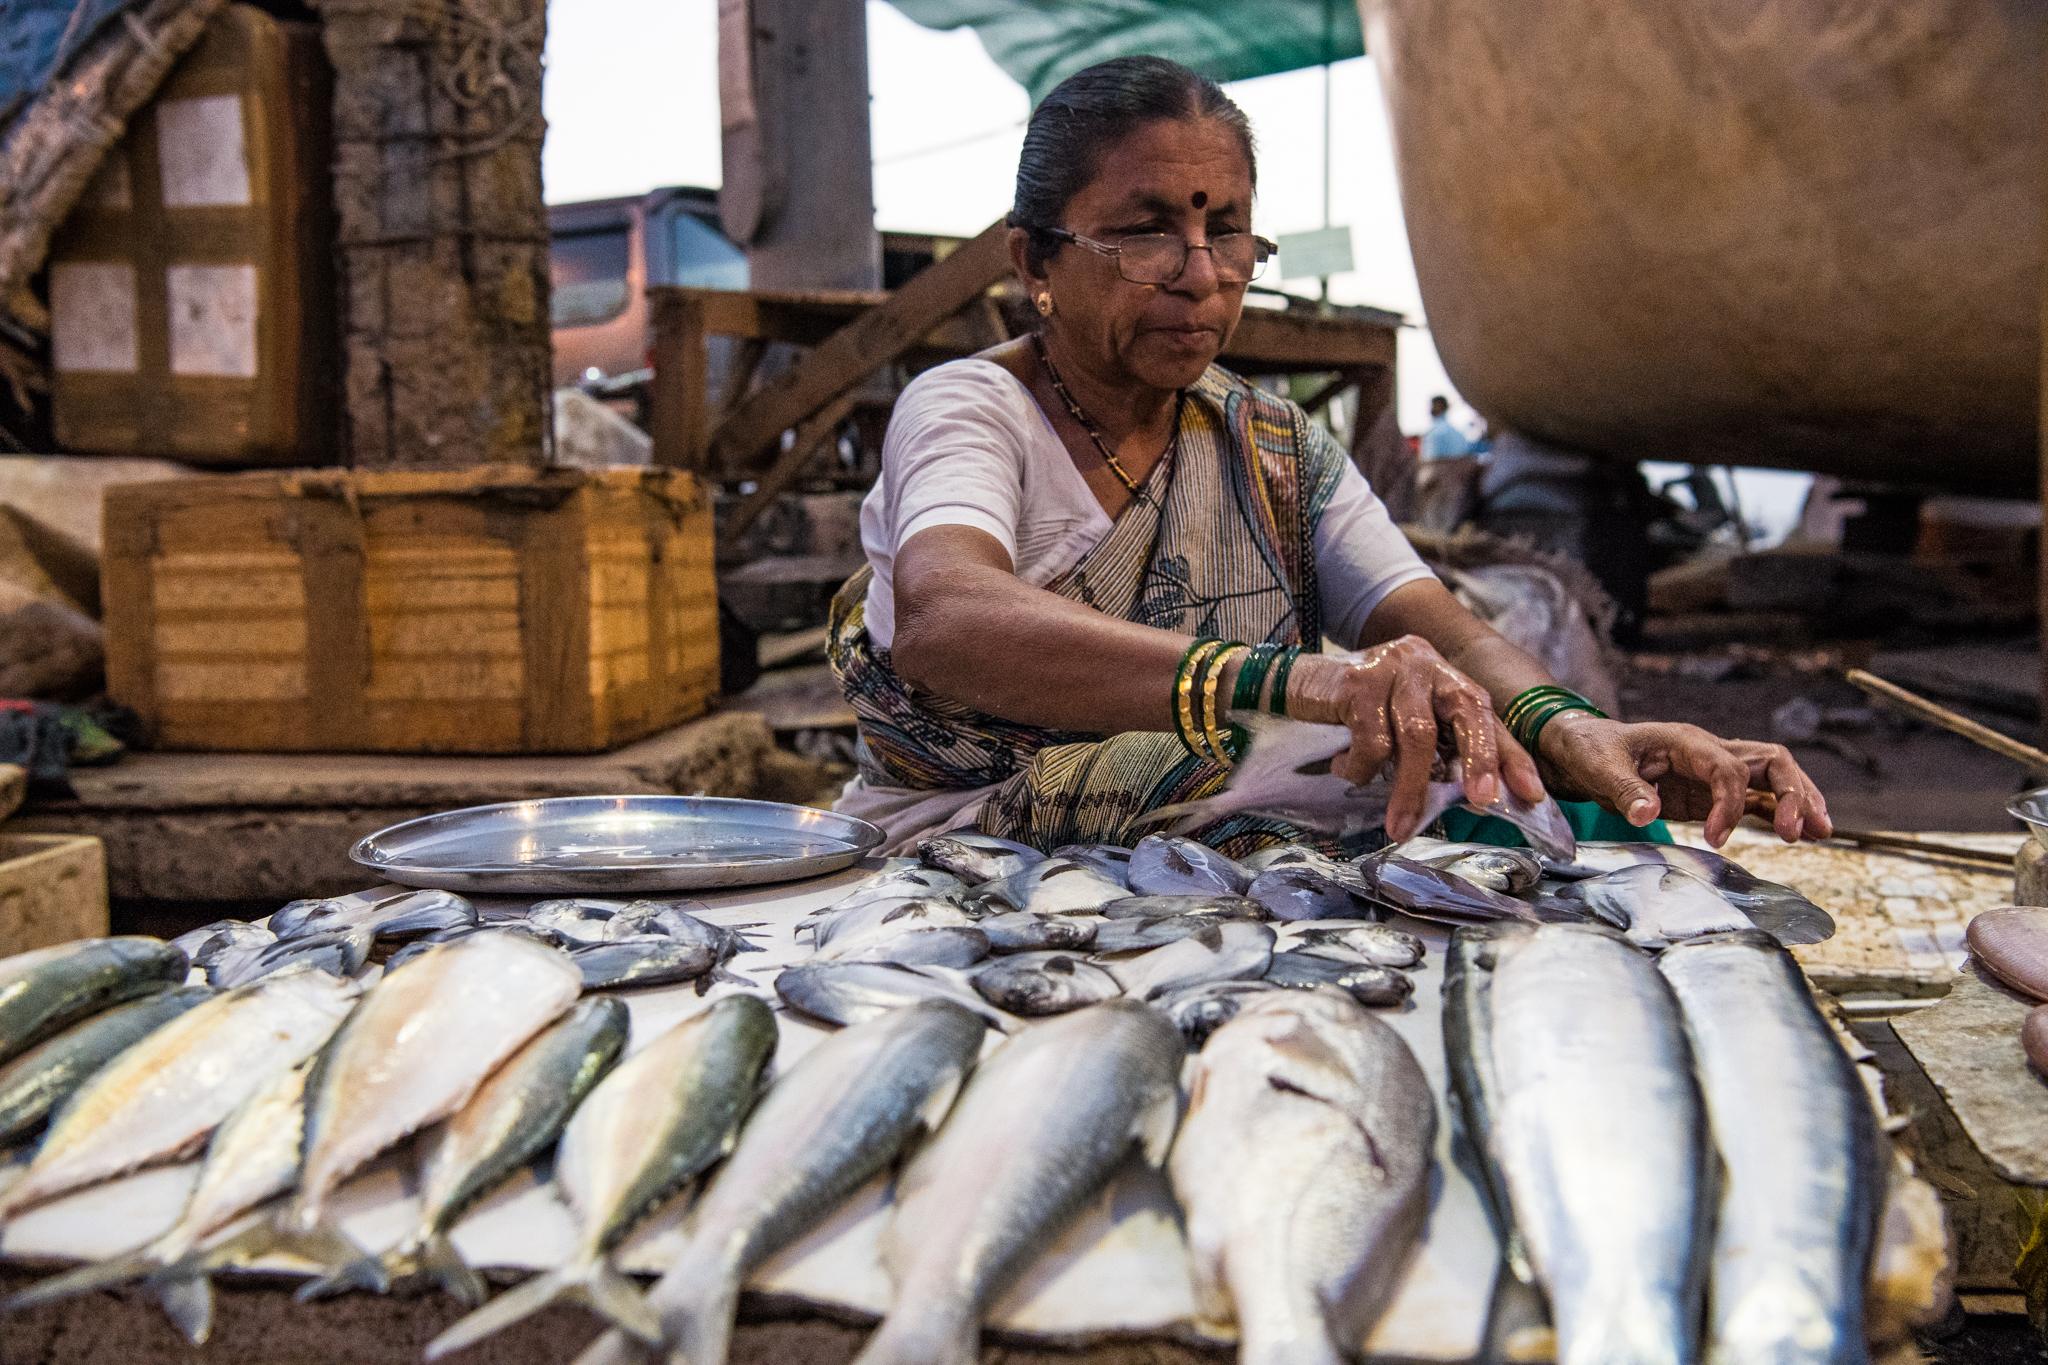 thetravelhub_india_mumbai street market.jpg